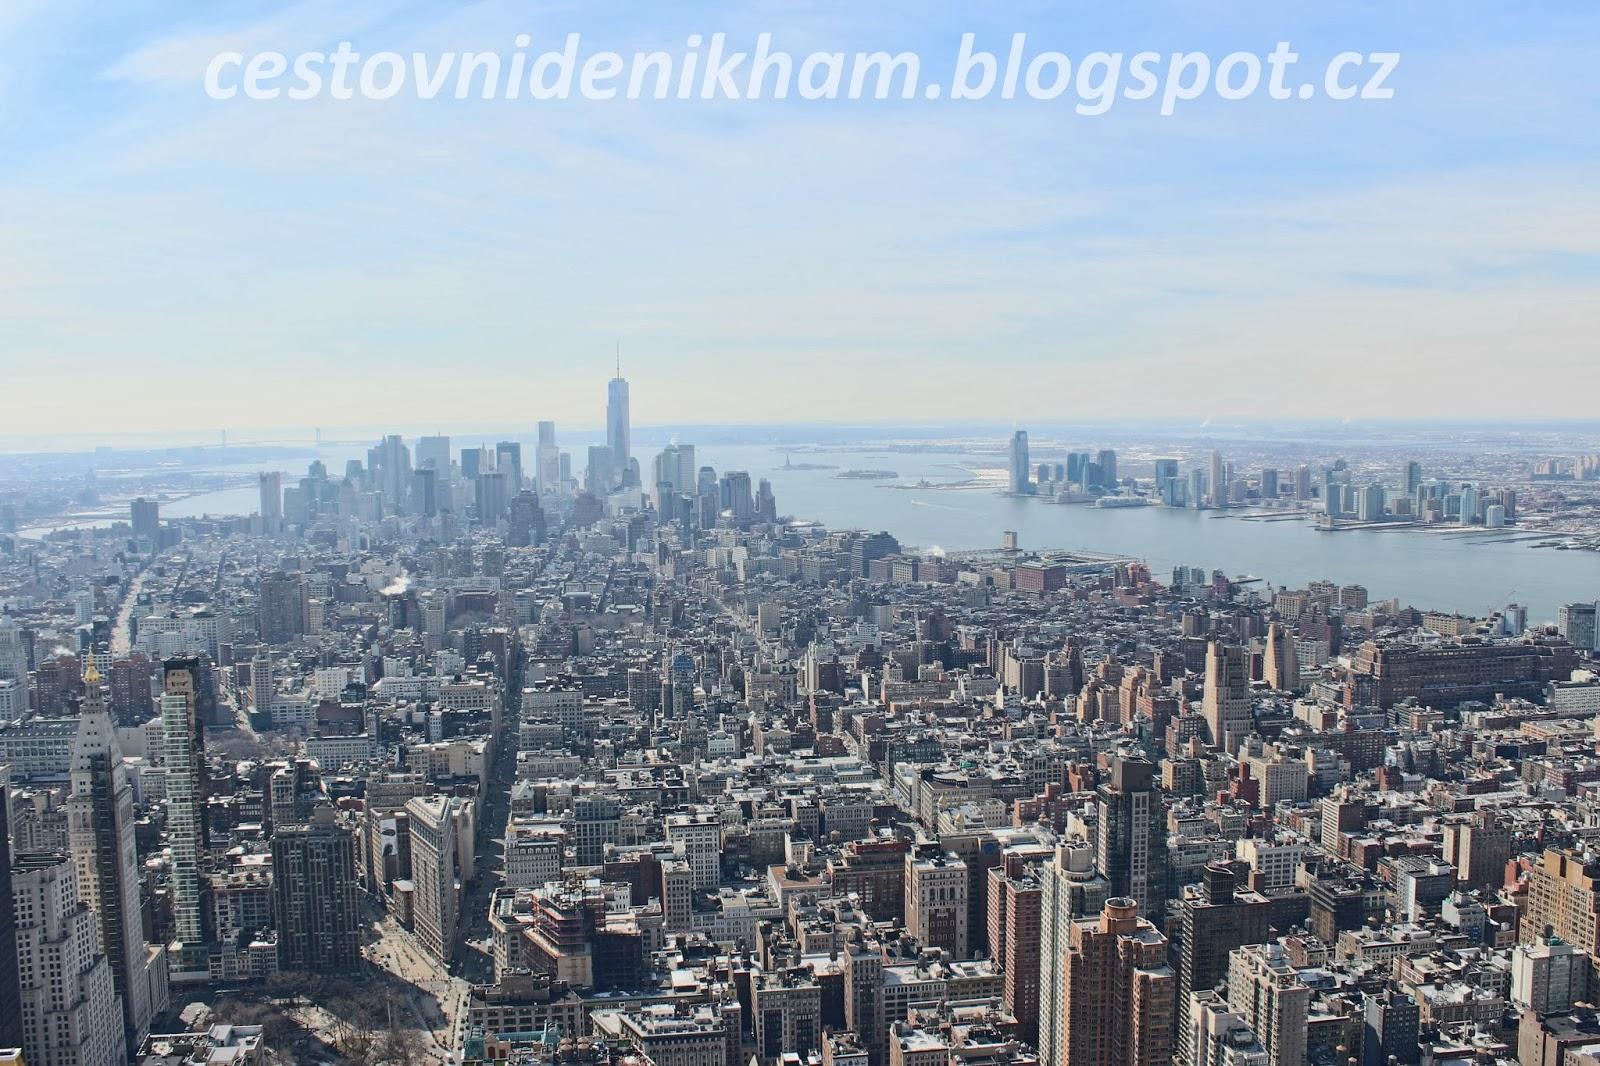 výhled na Manhattan // view of Manhattan